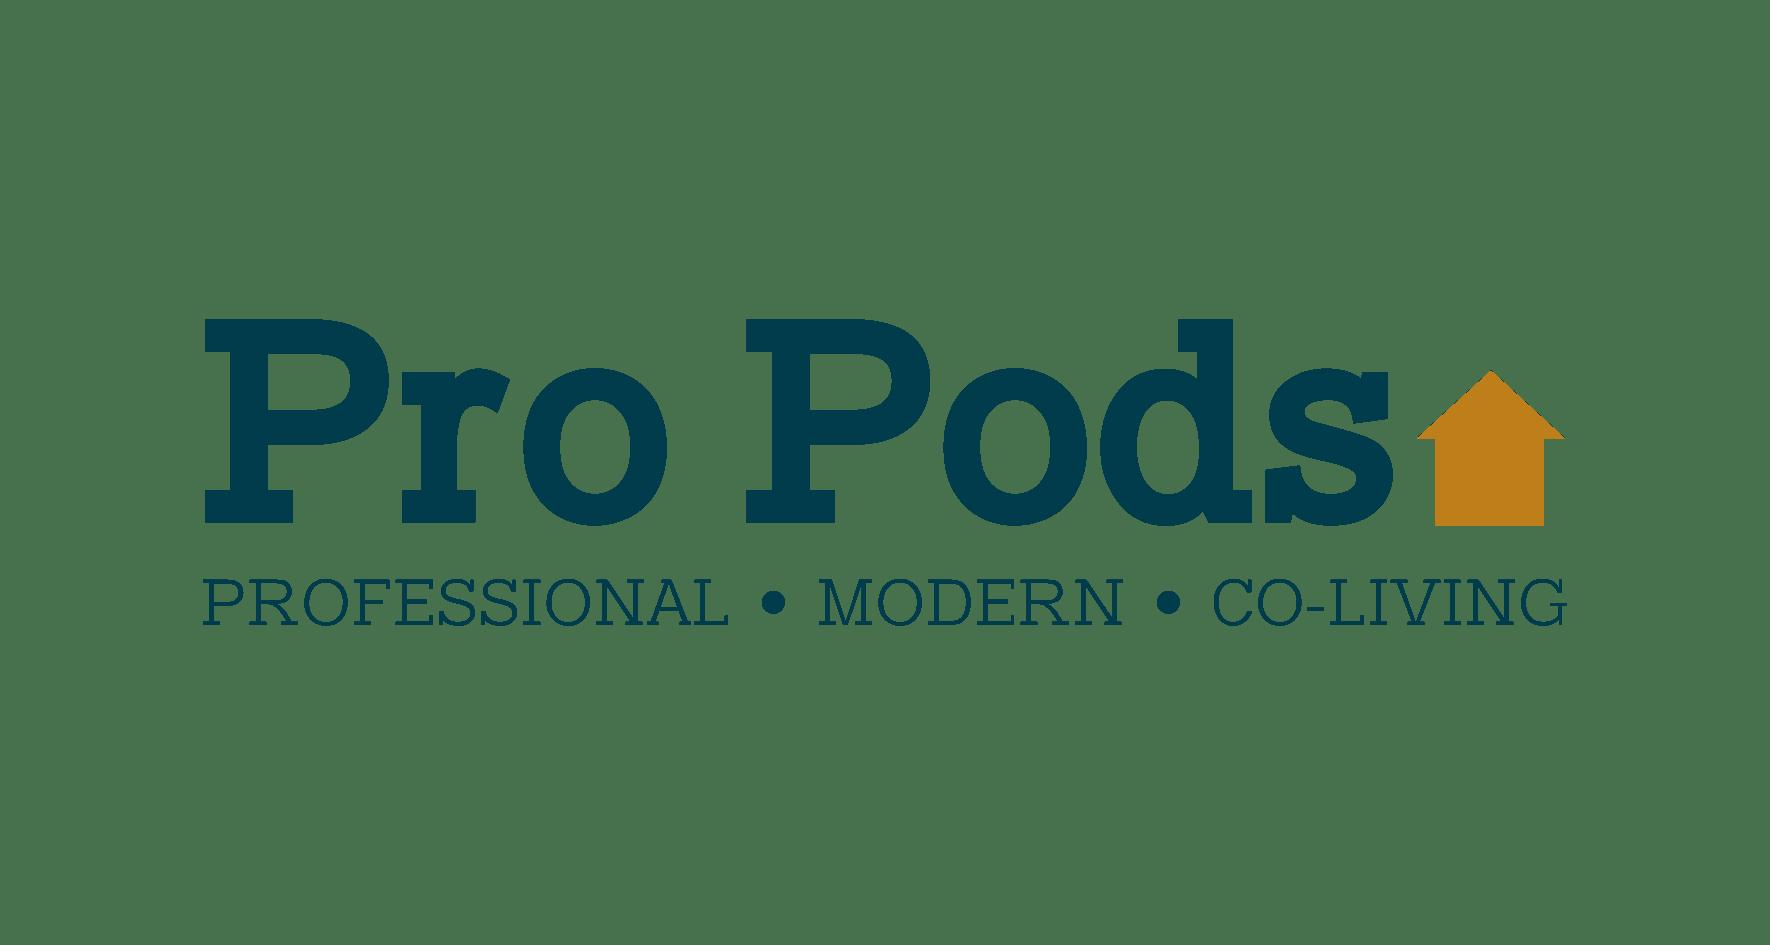 Pro Pods